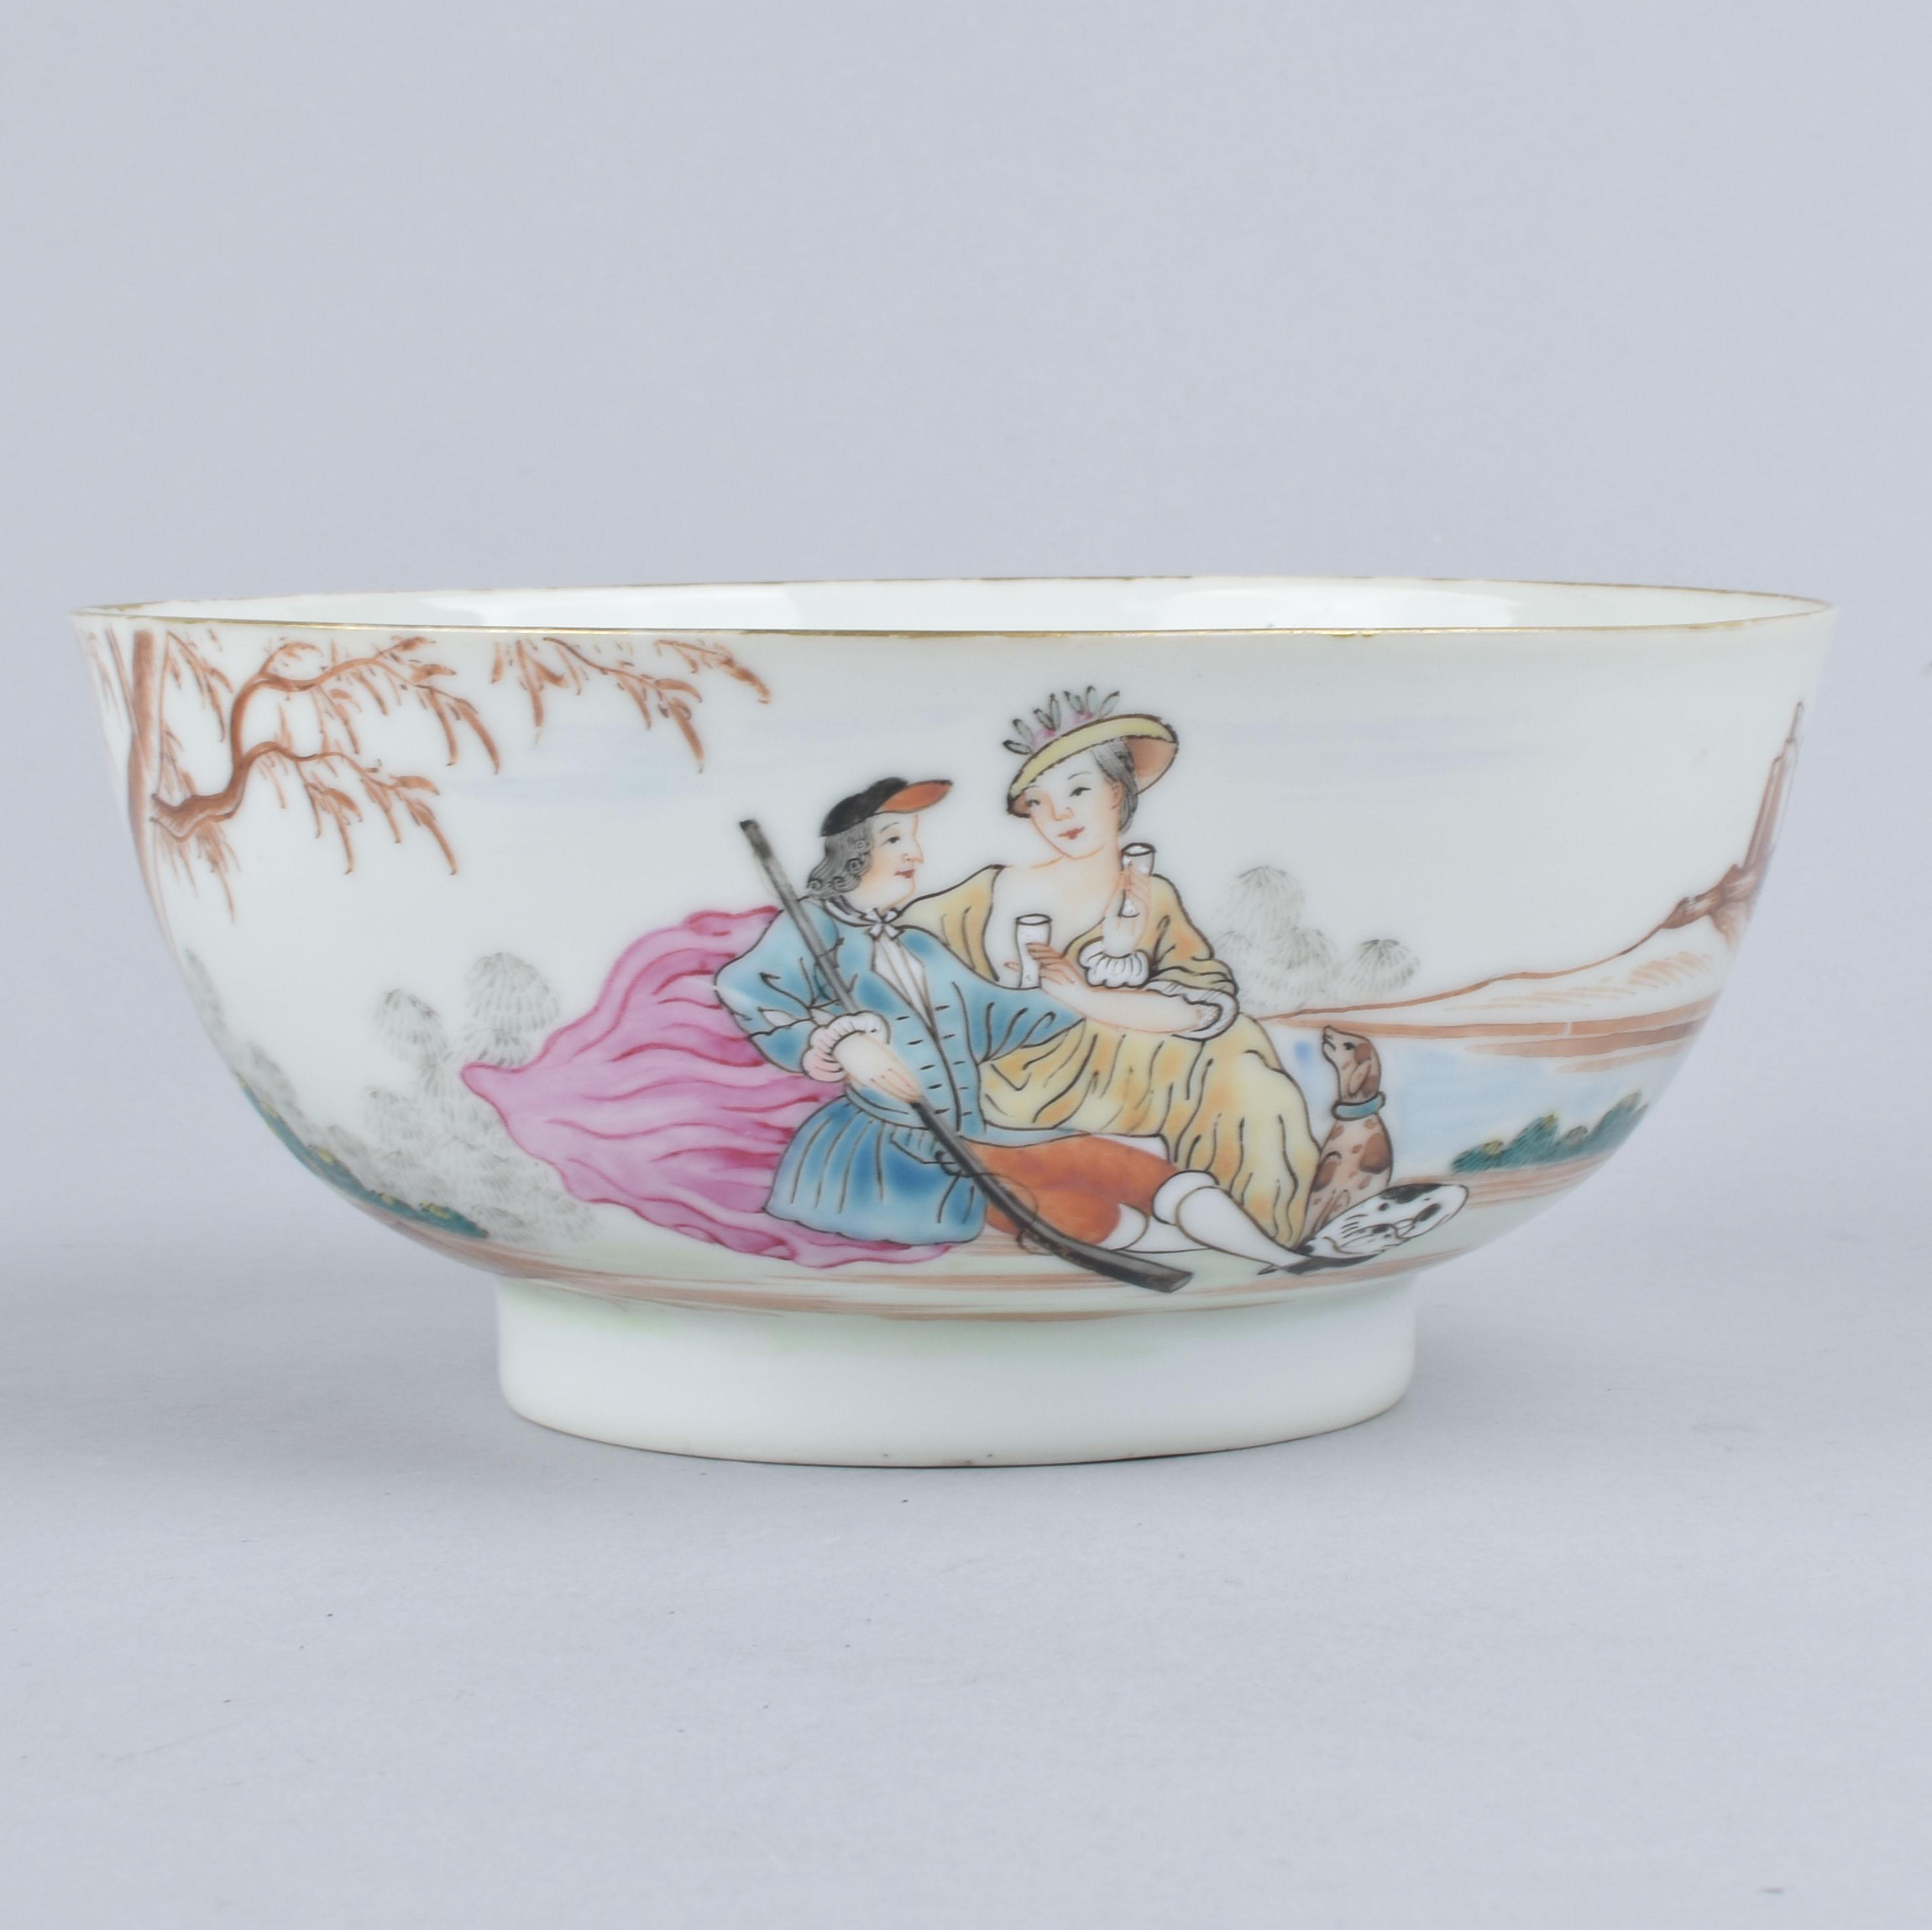 Porcelaine Qianlong (1736-1795), circa 1750, Chine